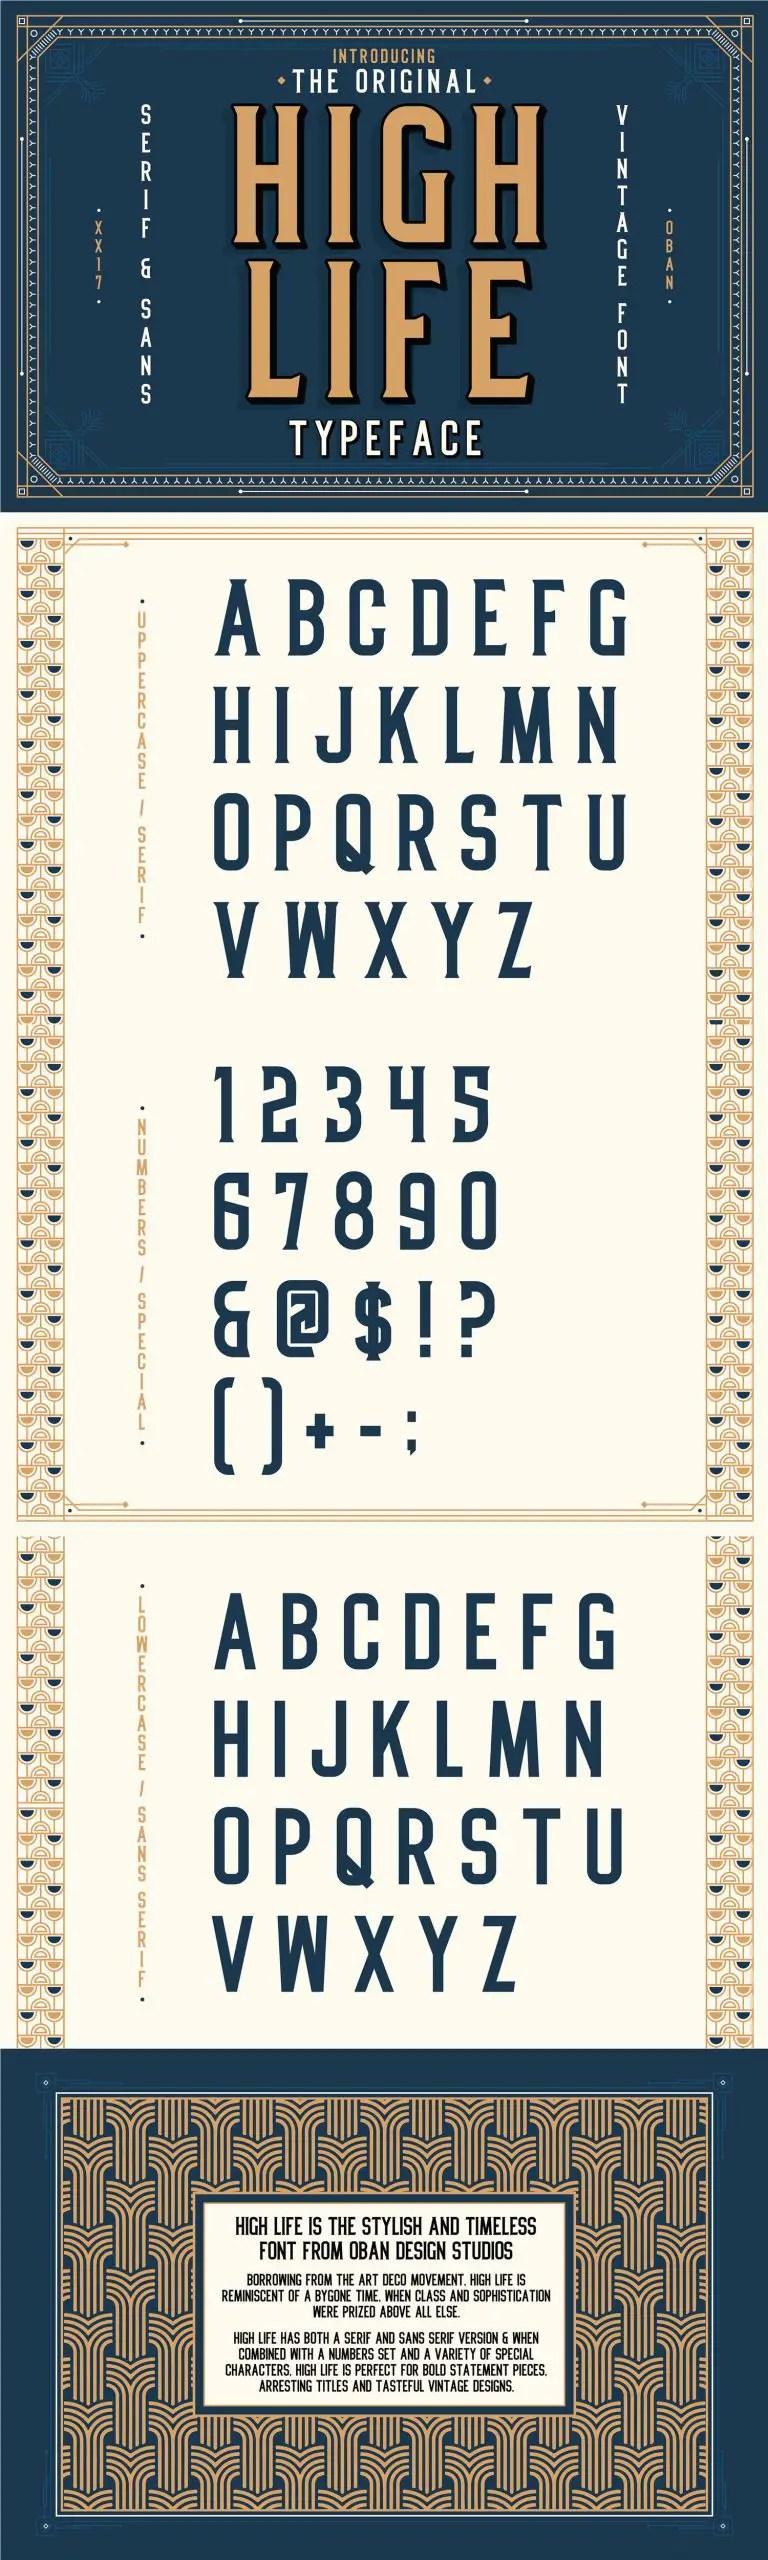 High Life Serif Typeface-1